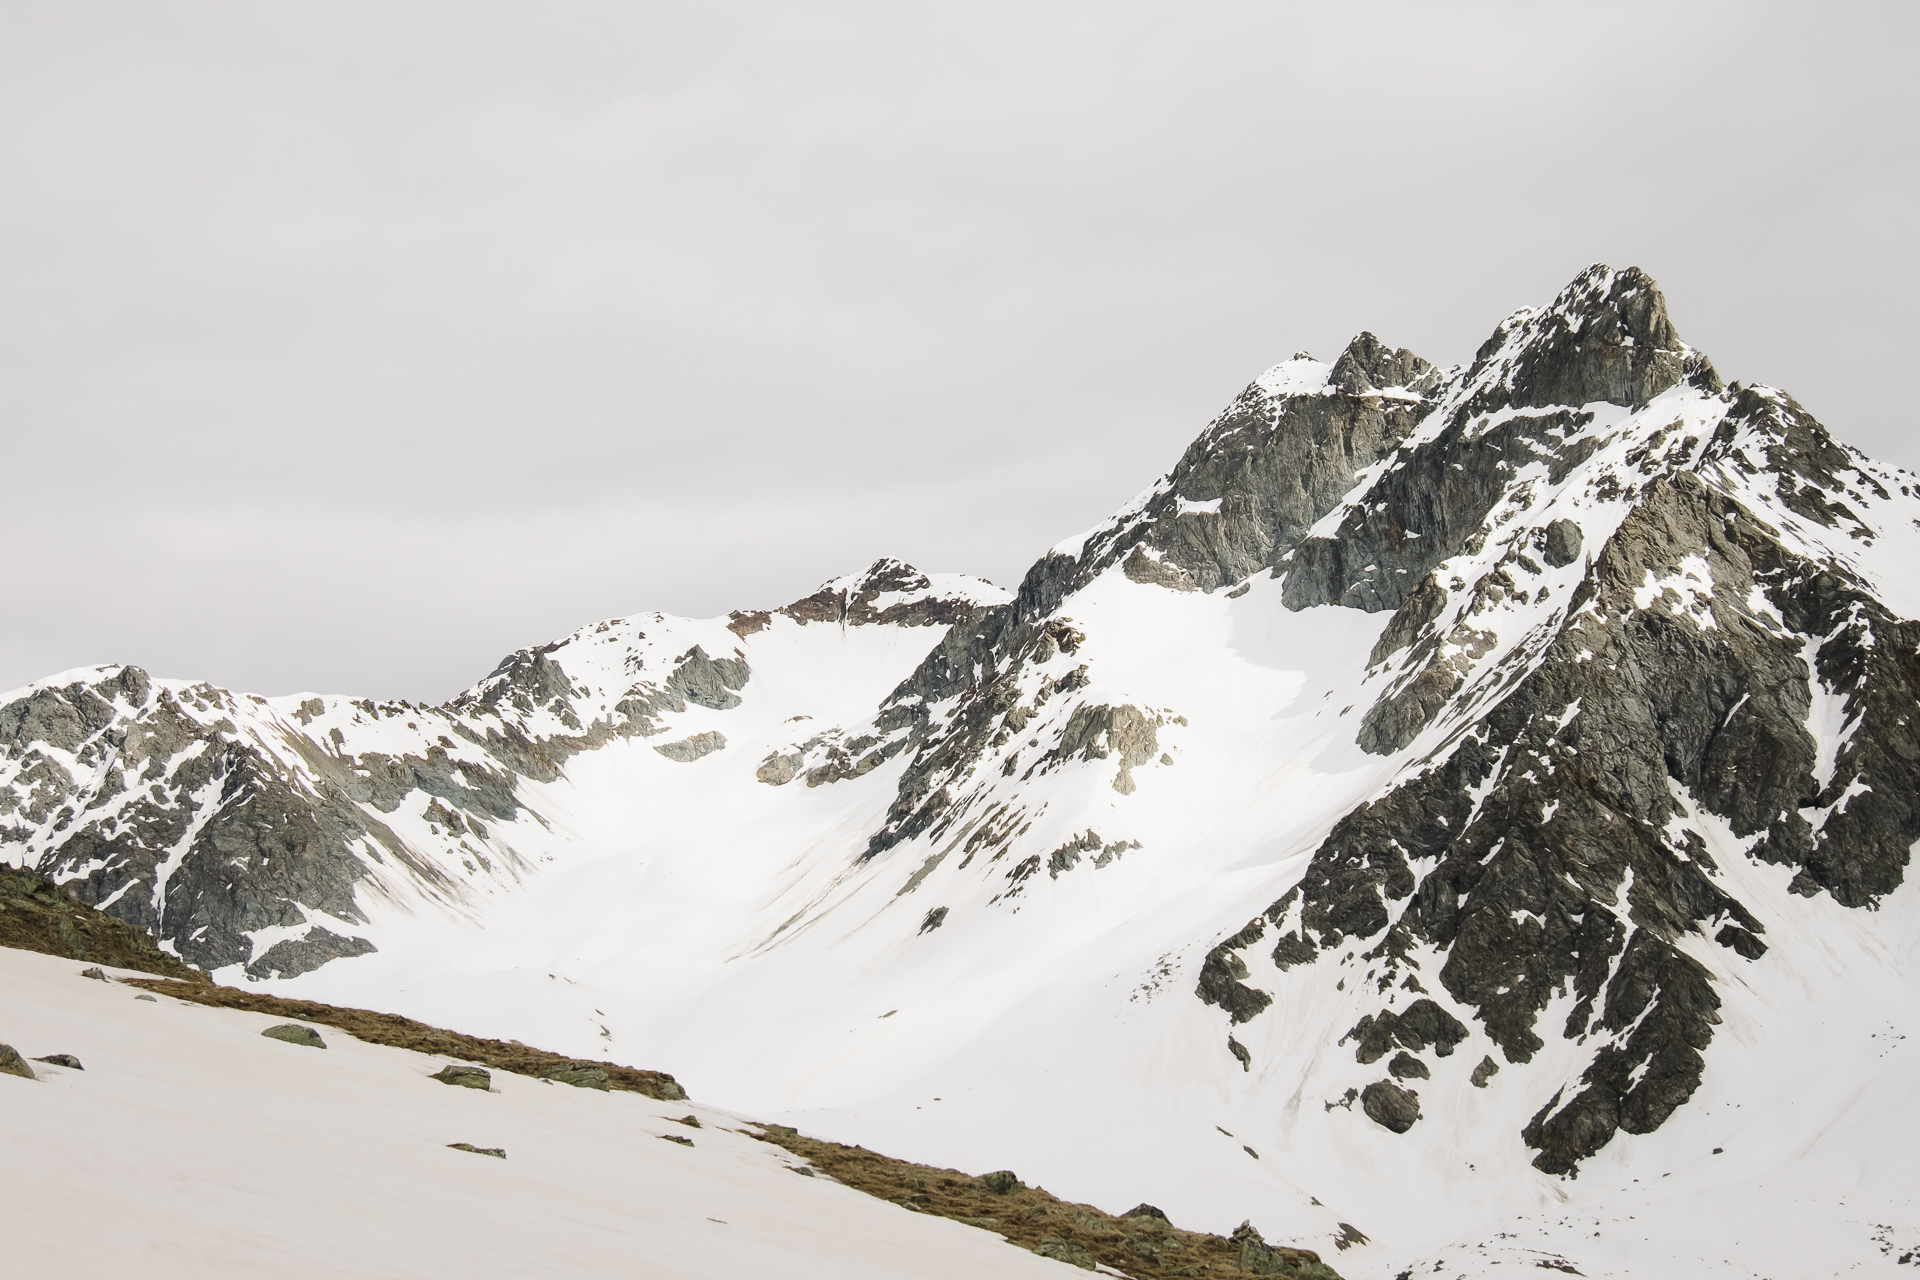 Muottas Muragl, Graubunden, Engadin St Moritz, Switzerland